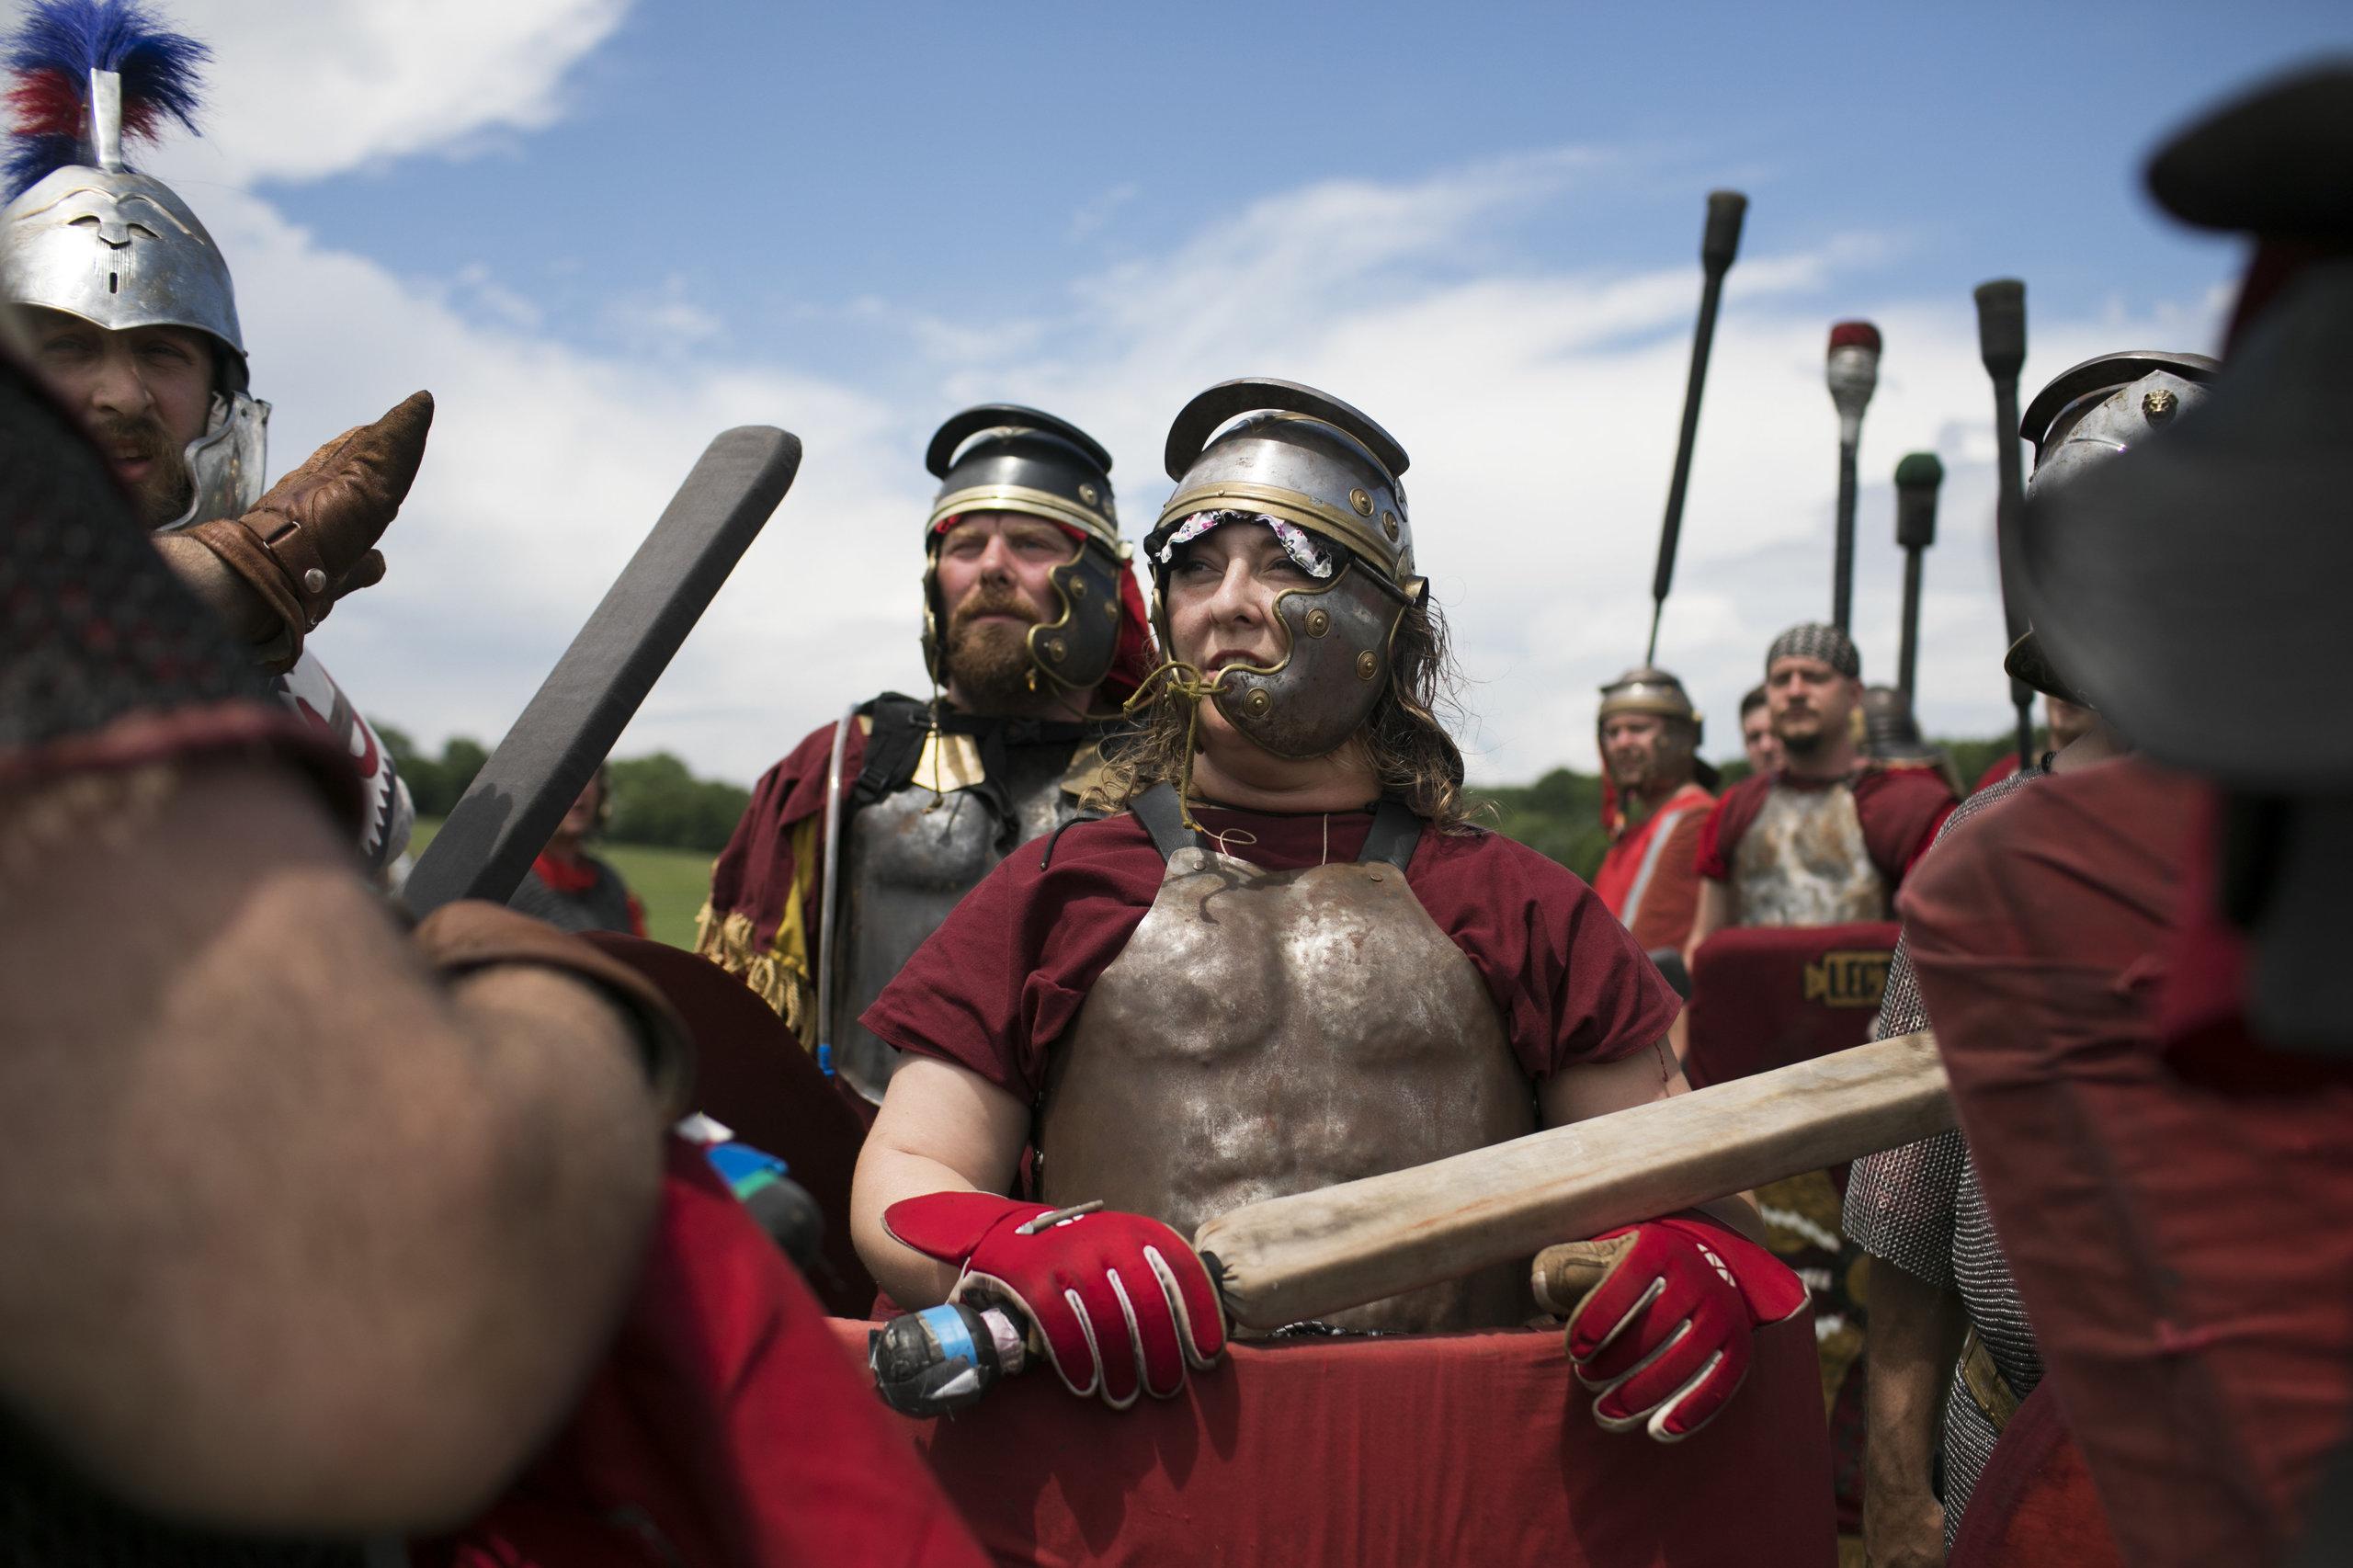 Ragnarok attendees preparing to battle.